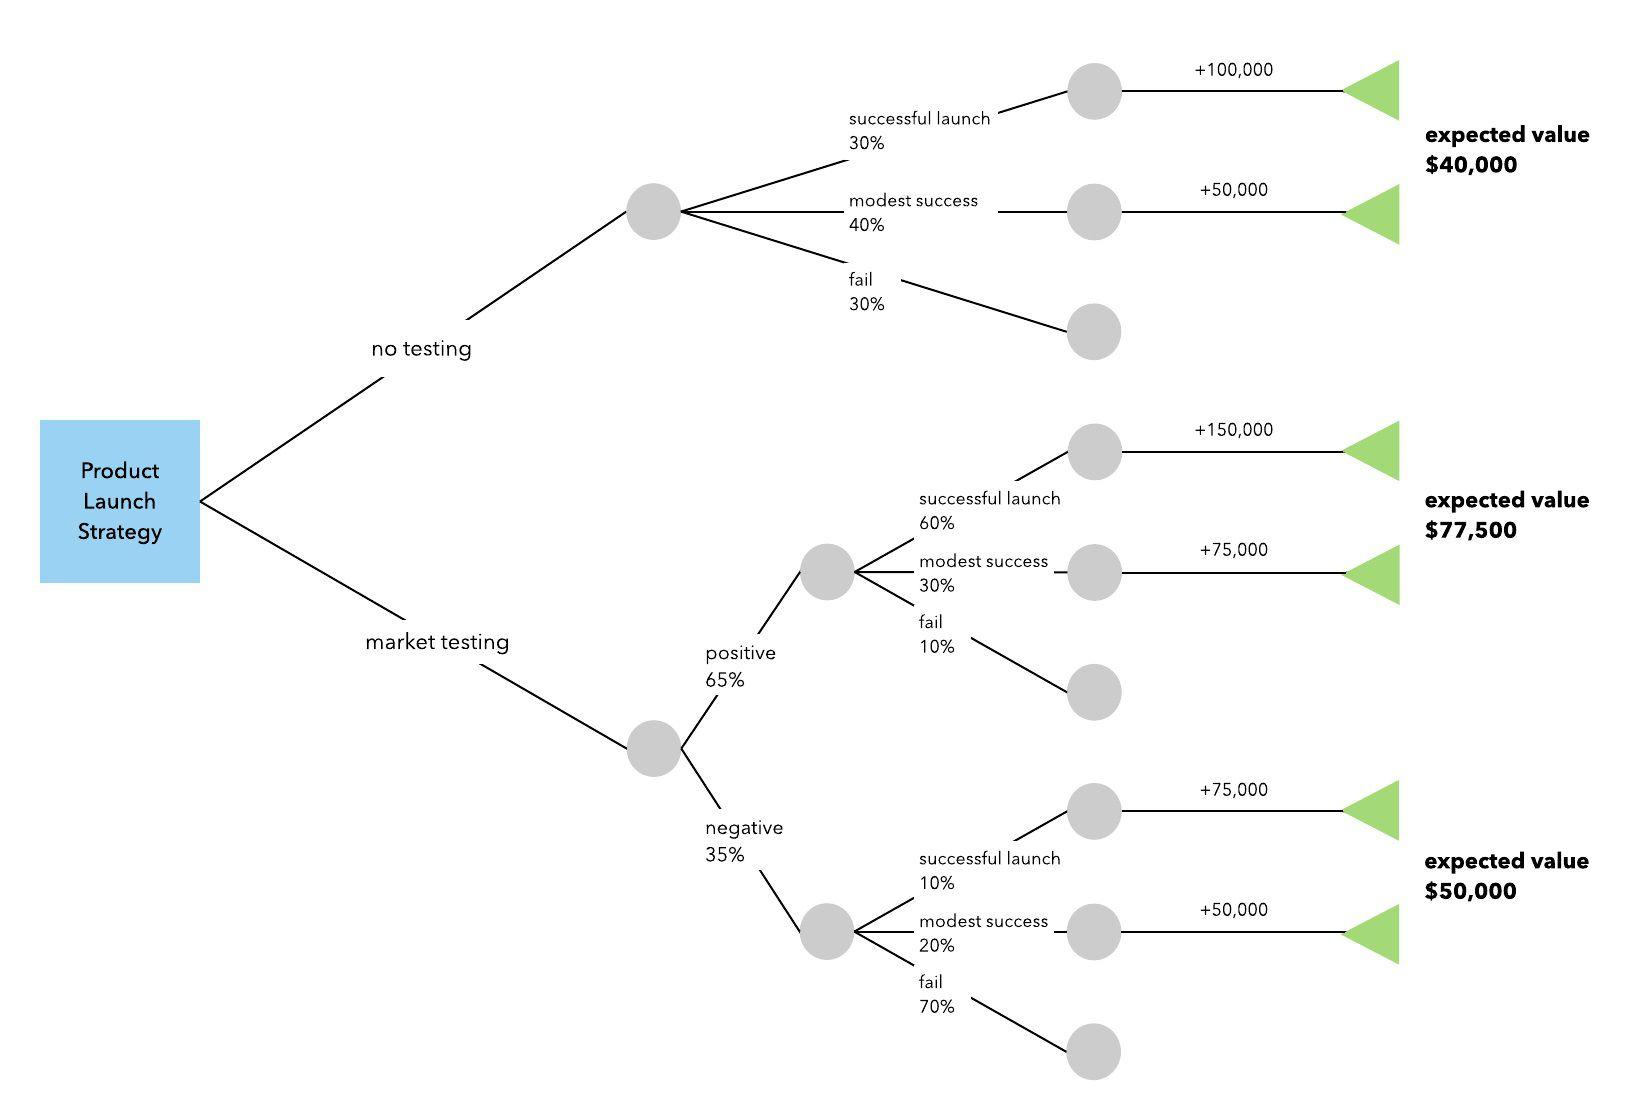 003 Simple Decision Tree Template Excel 2016 Sample Full